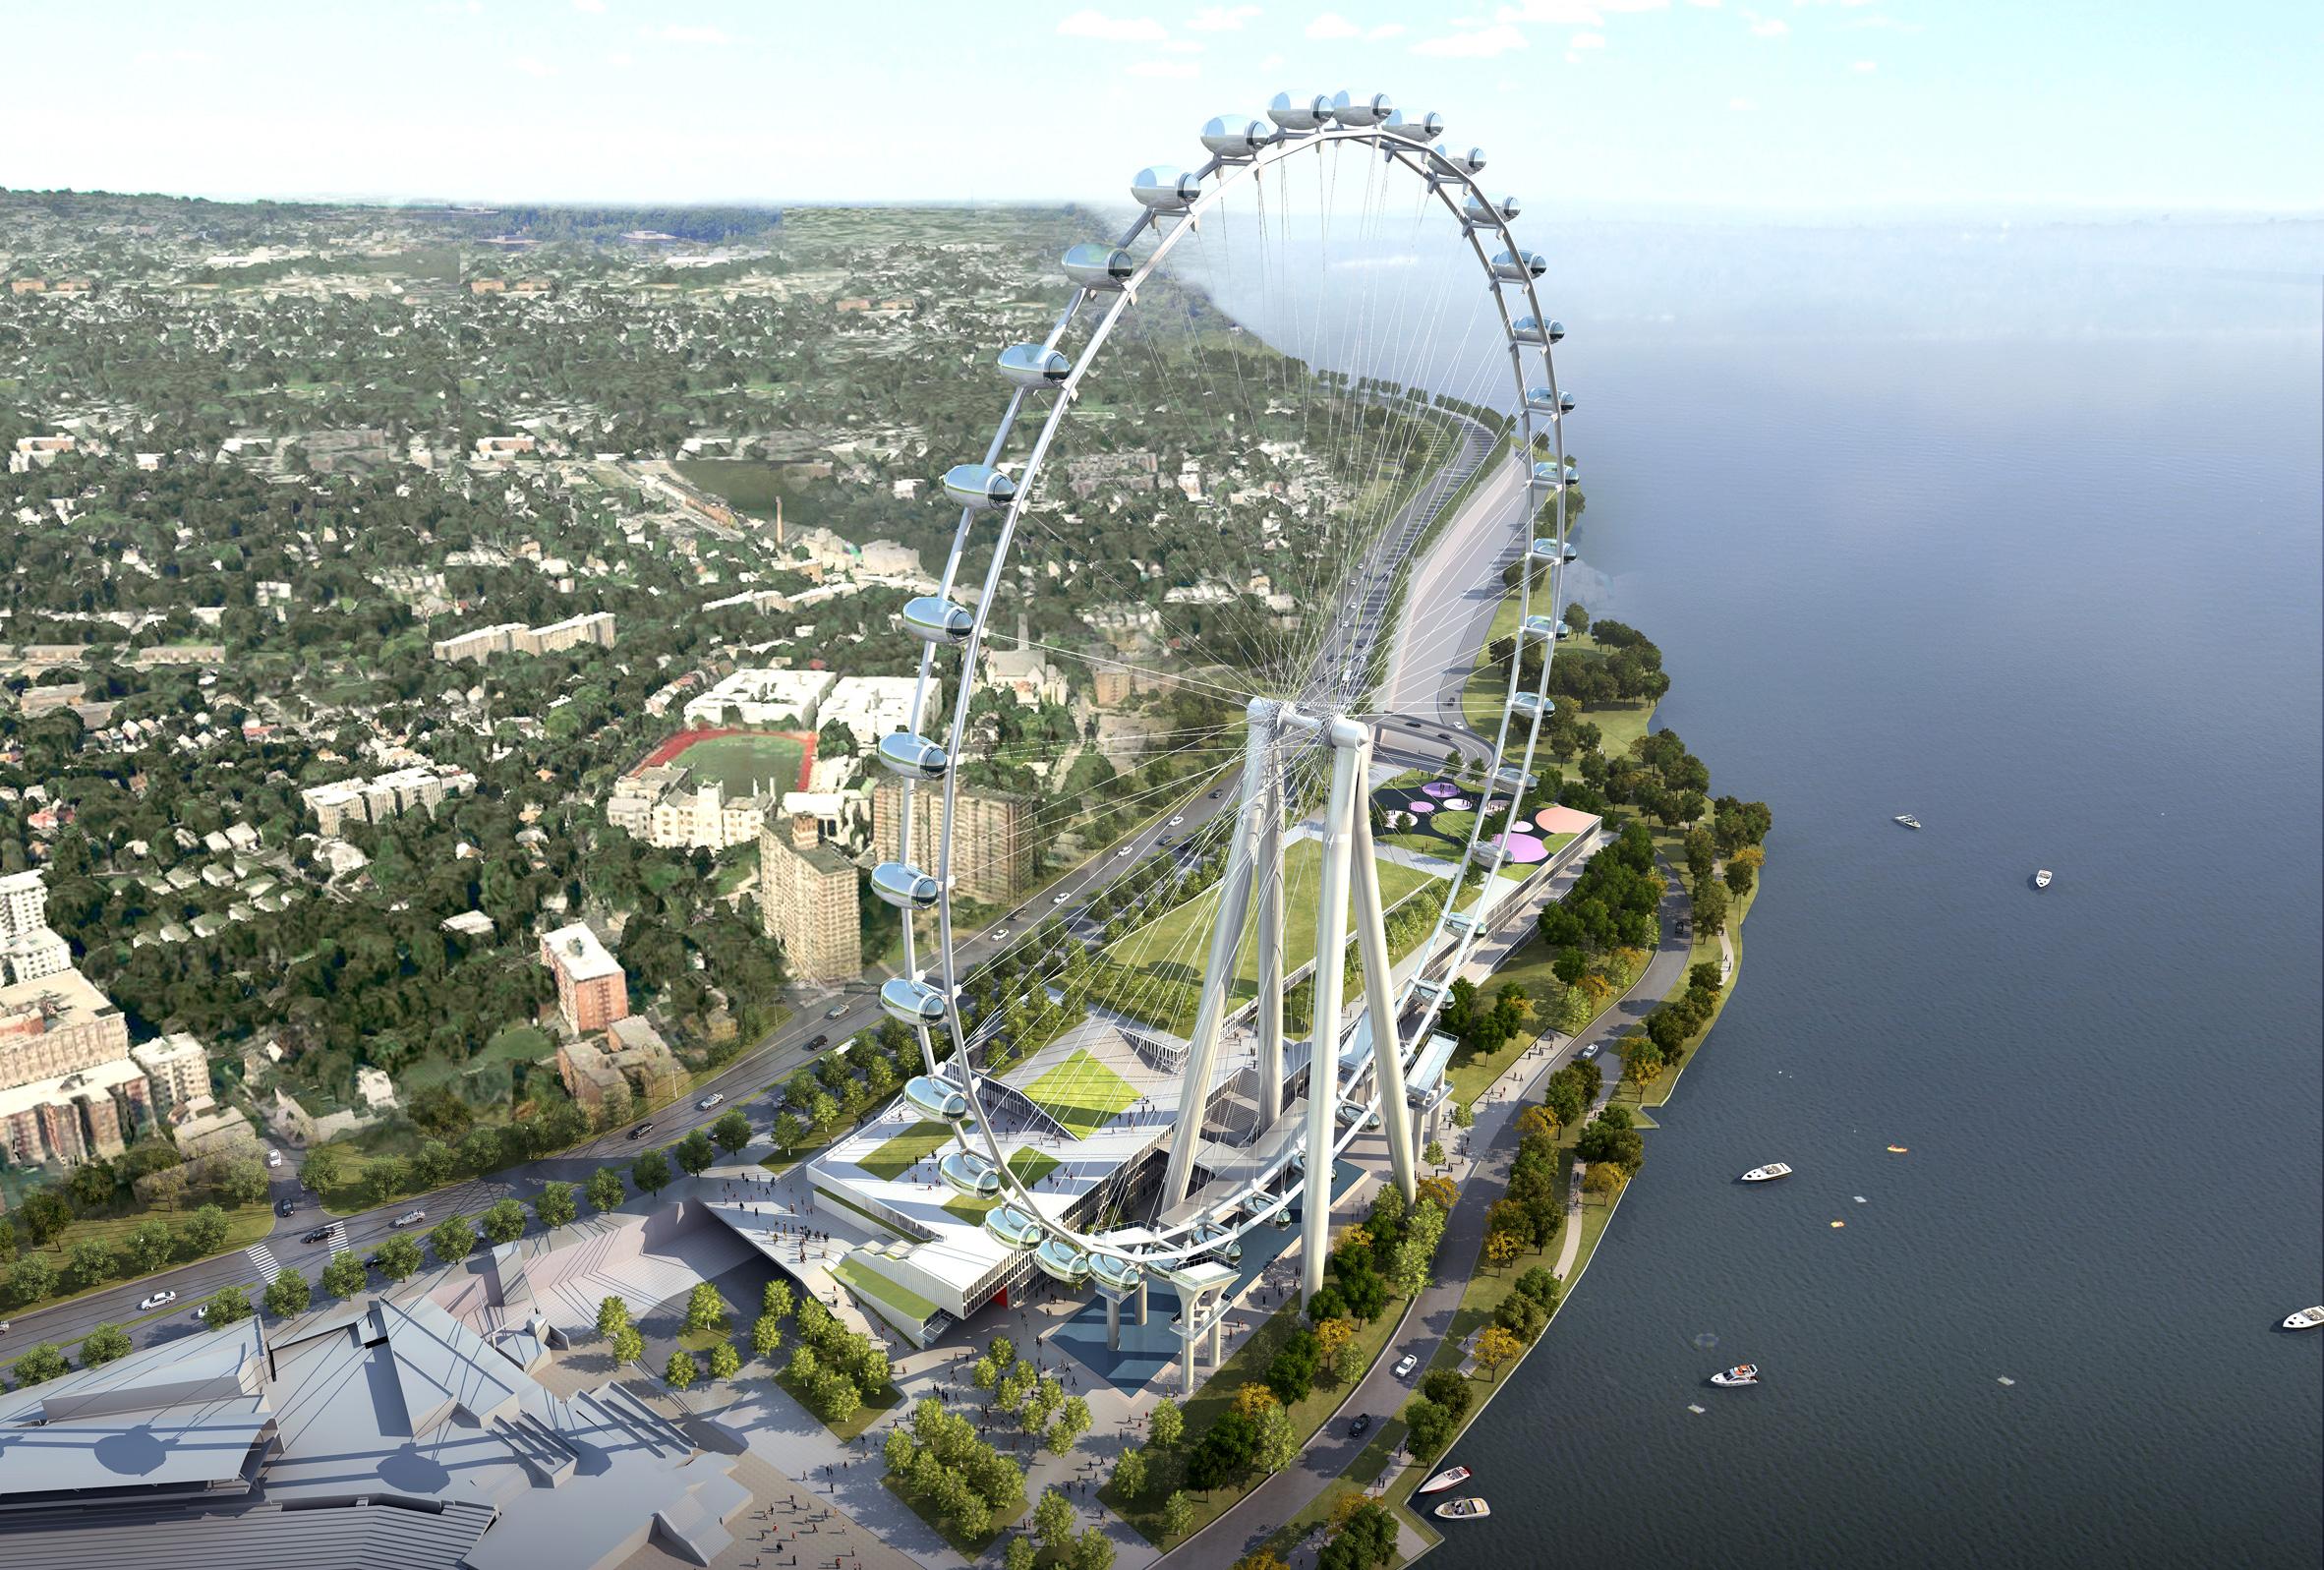 New York Wheel developers abandon plans for Staten Island attraction